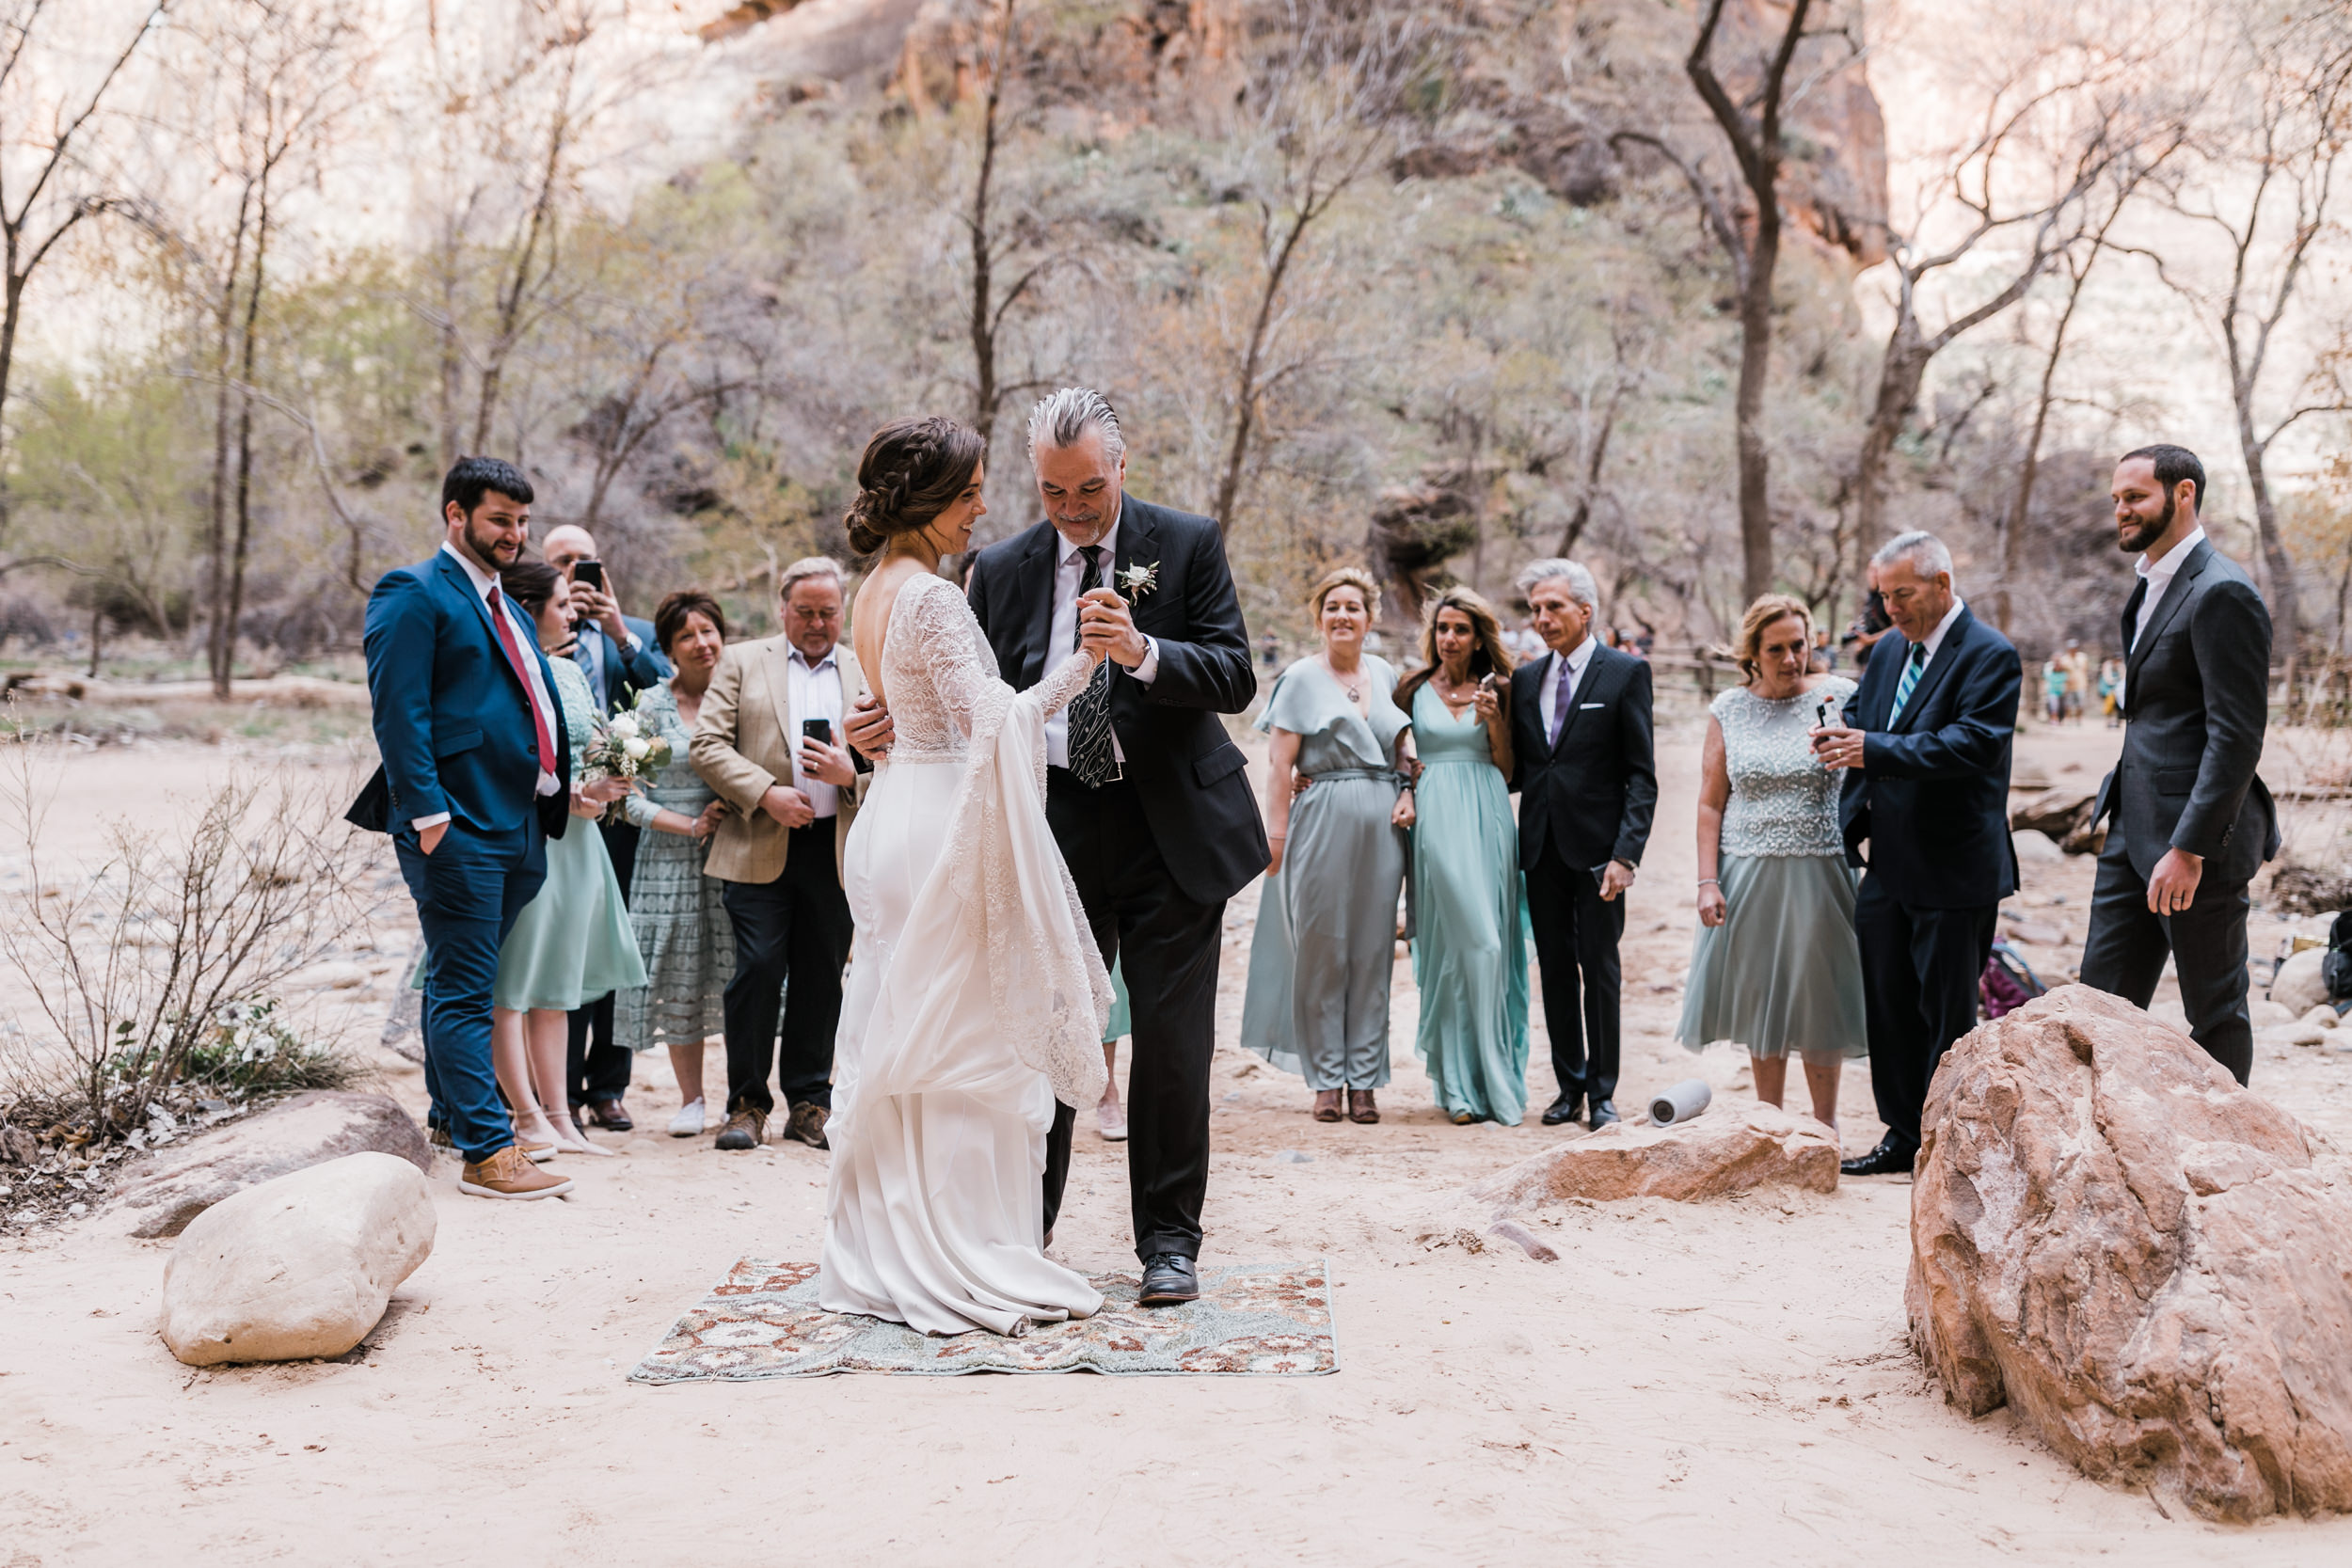 Zion-National-Park-Adventure-Wedding-Hearnes-Elopement-Photography-18.jpg